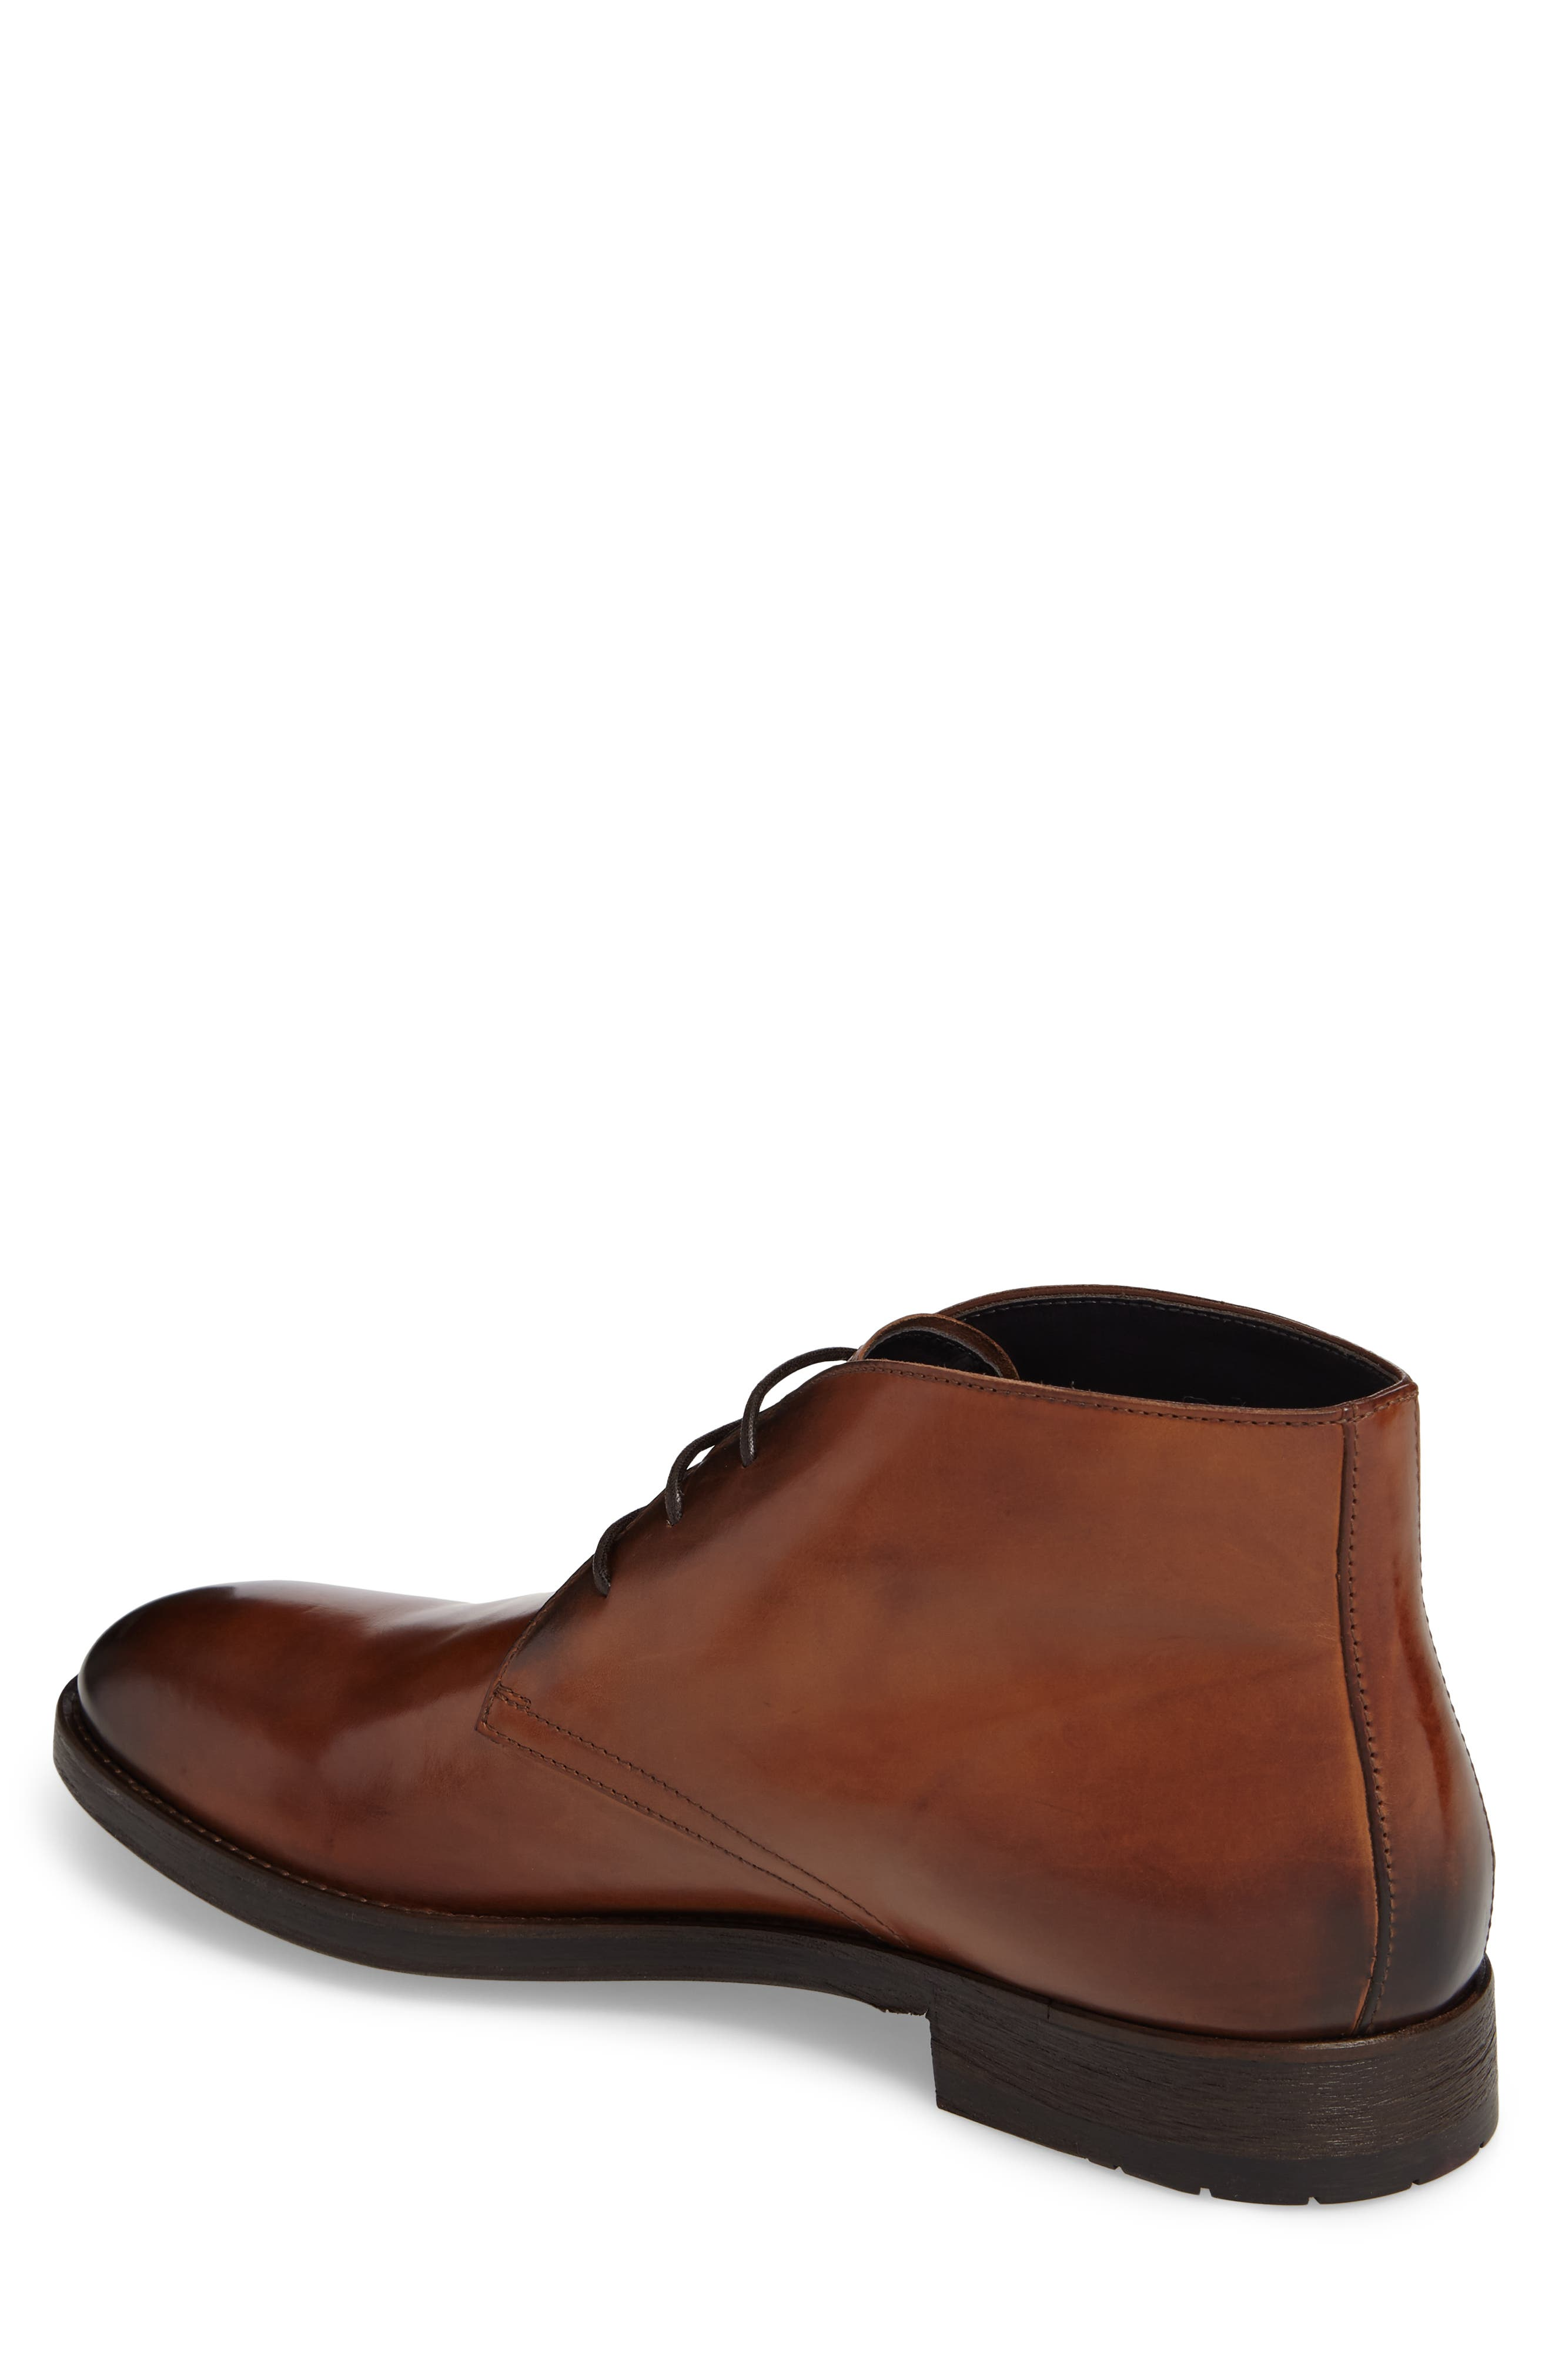 Alternate Image 2  - To Boot New York Connor Chukka Boot (Men)